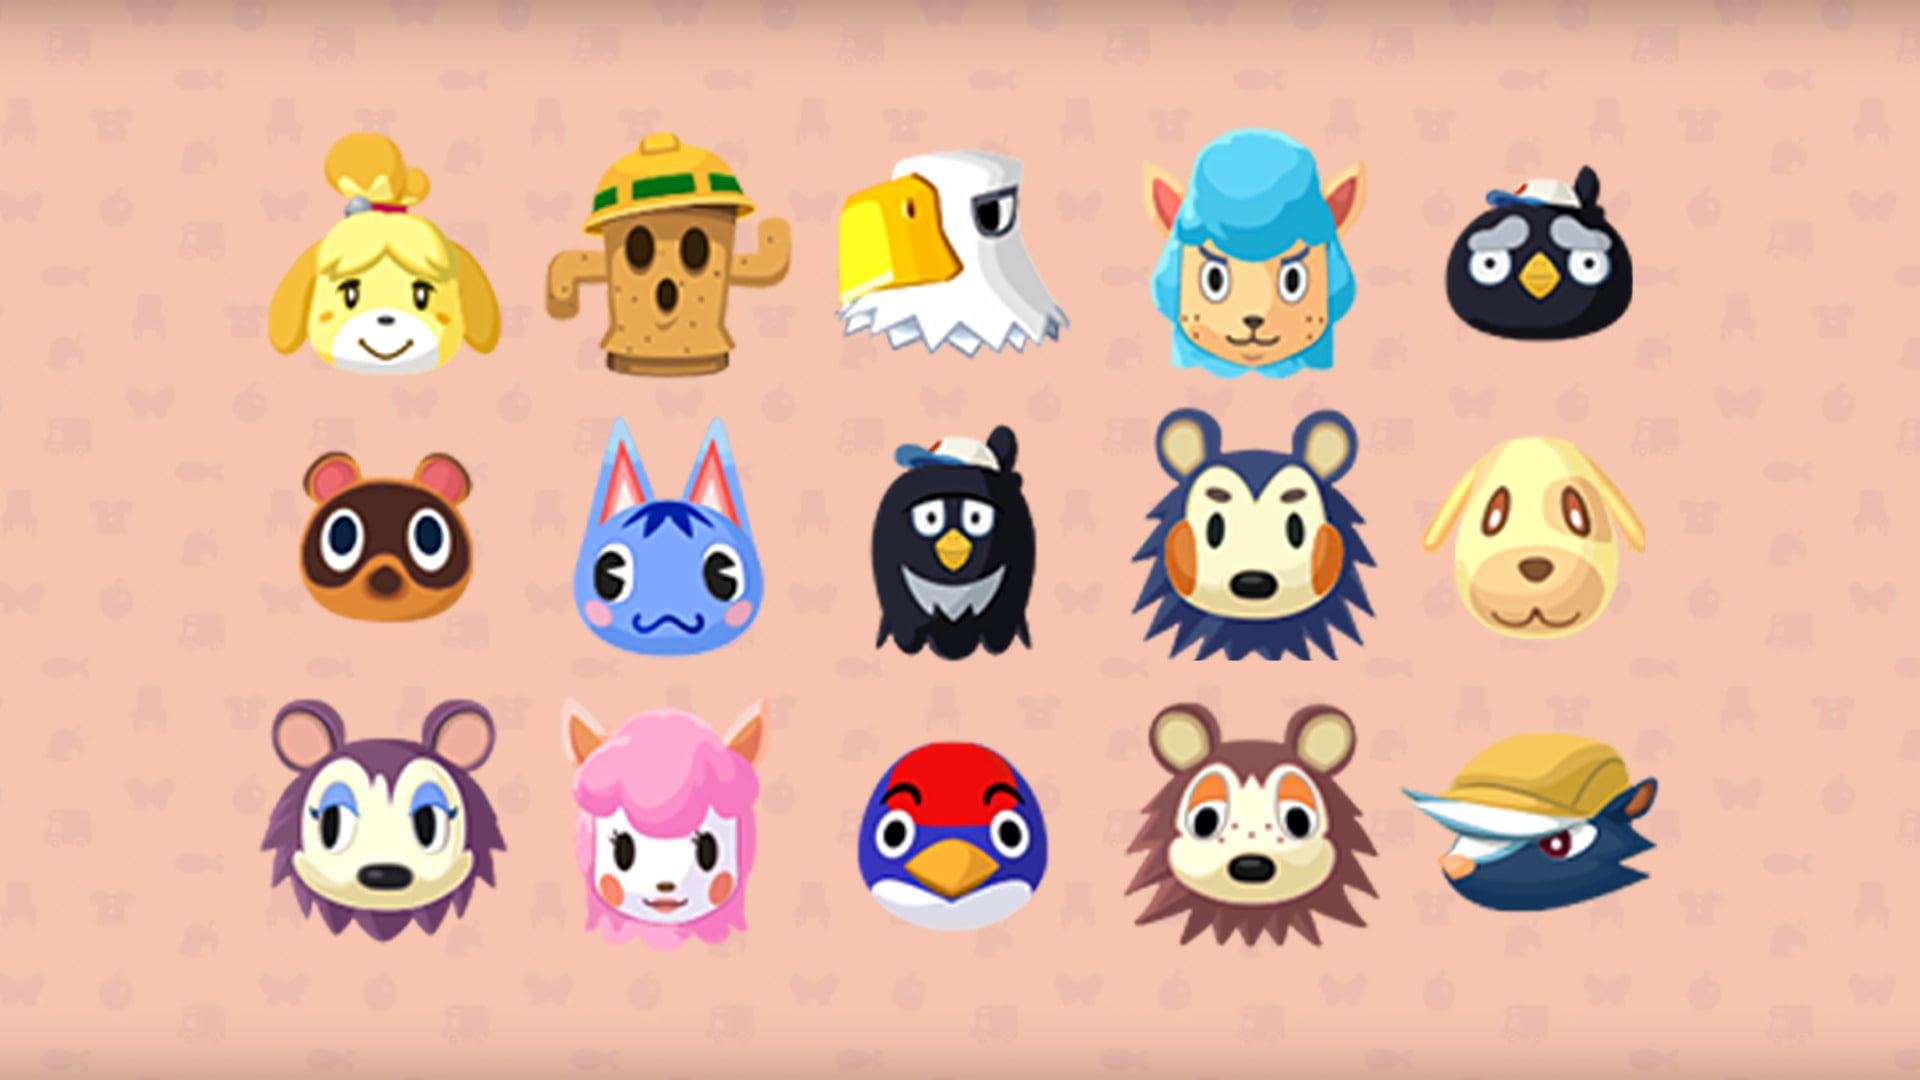 Animal Crossing Animal Crossing Pocket Camp 1080p Wallpaper Hdwallpaper Desktop Animal Crossing Pocket Camp Animal Crossing Bob Animal Crossing